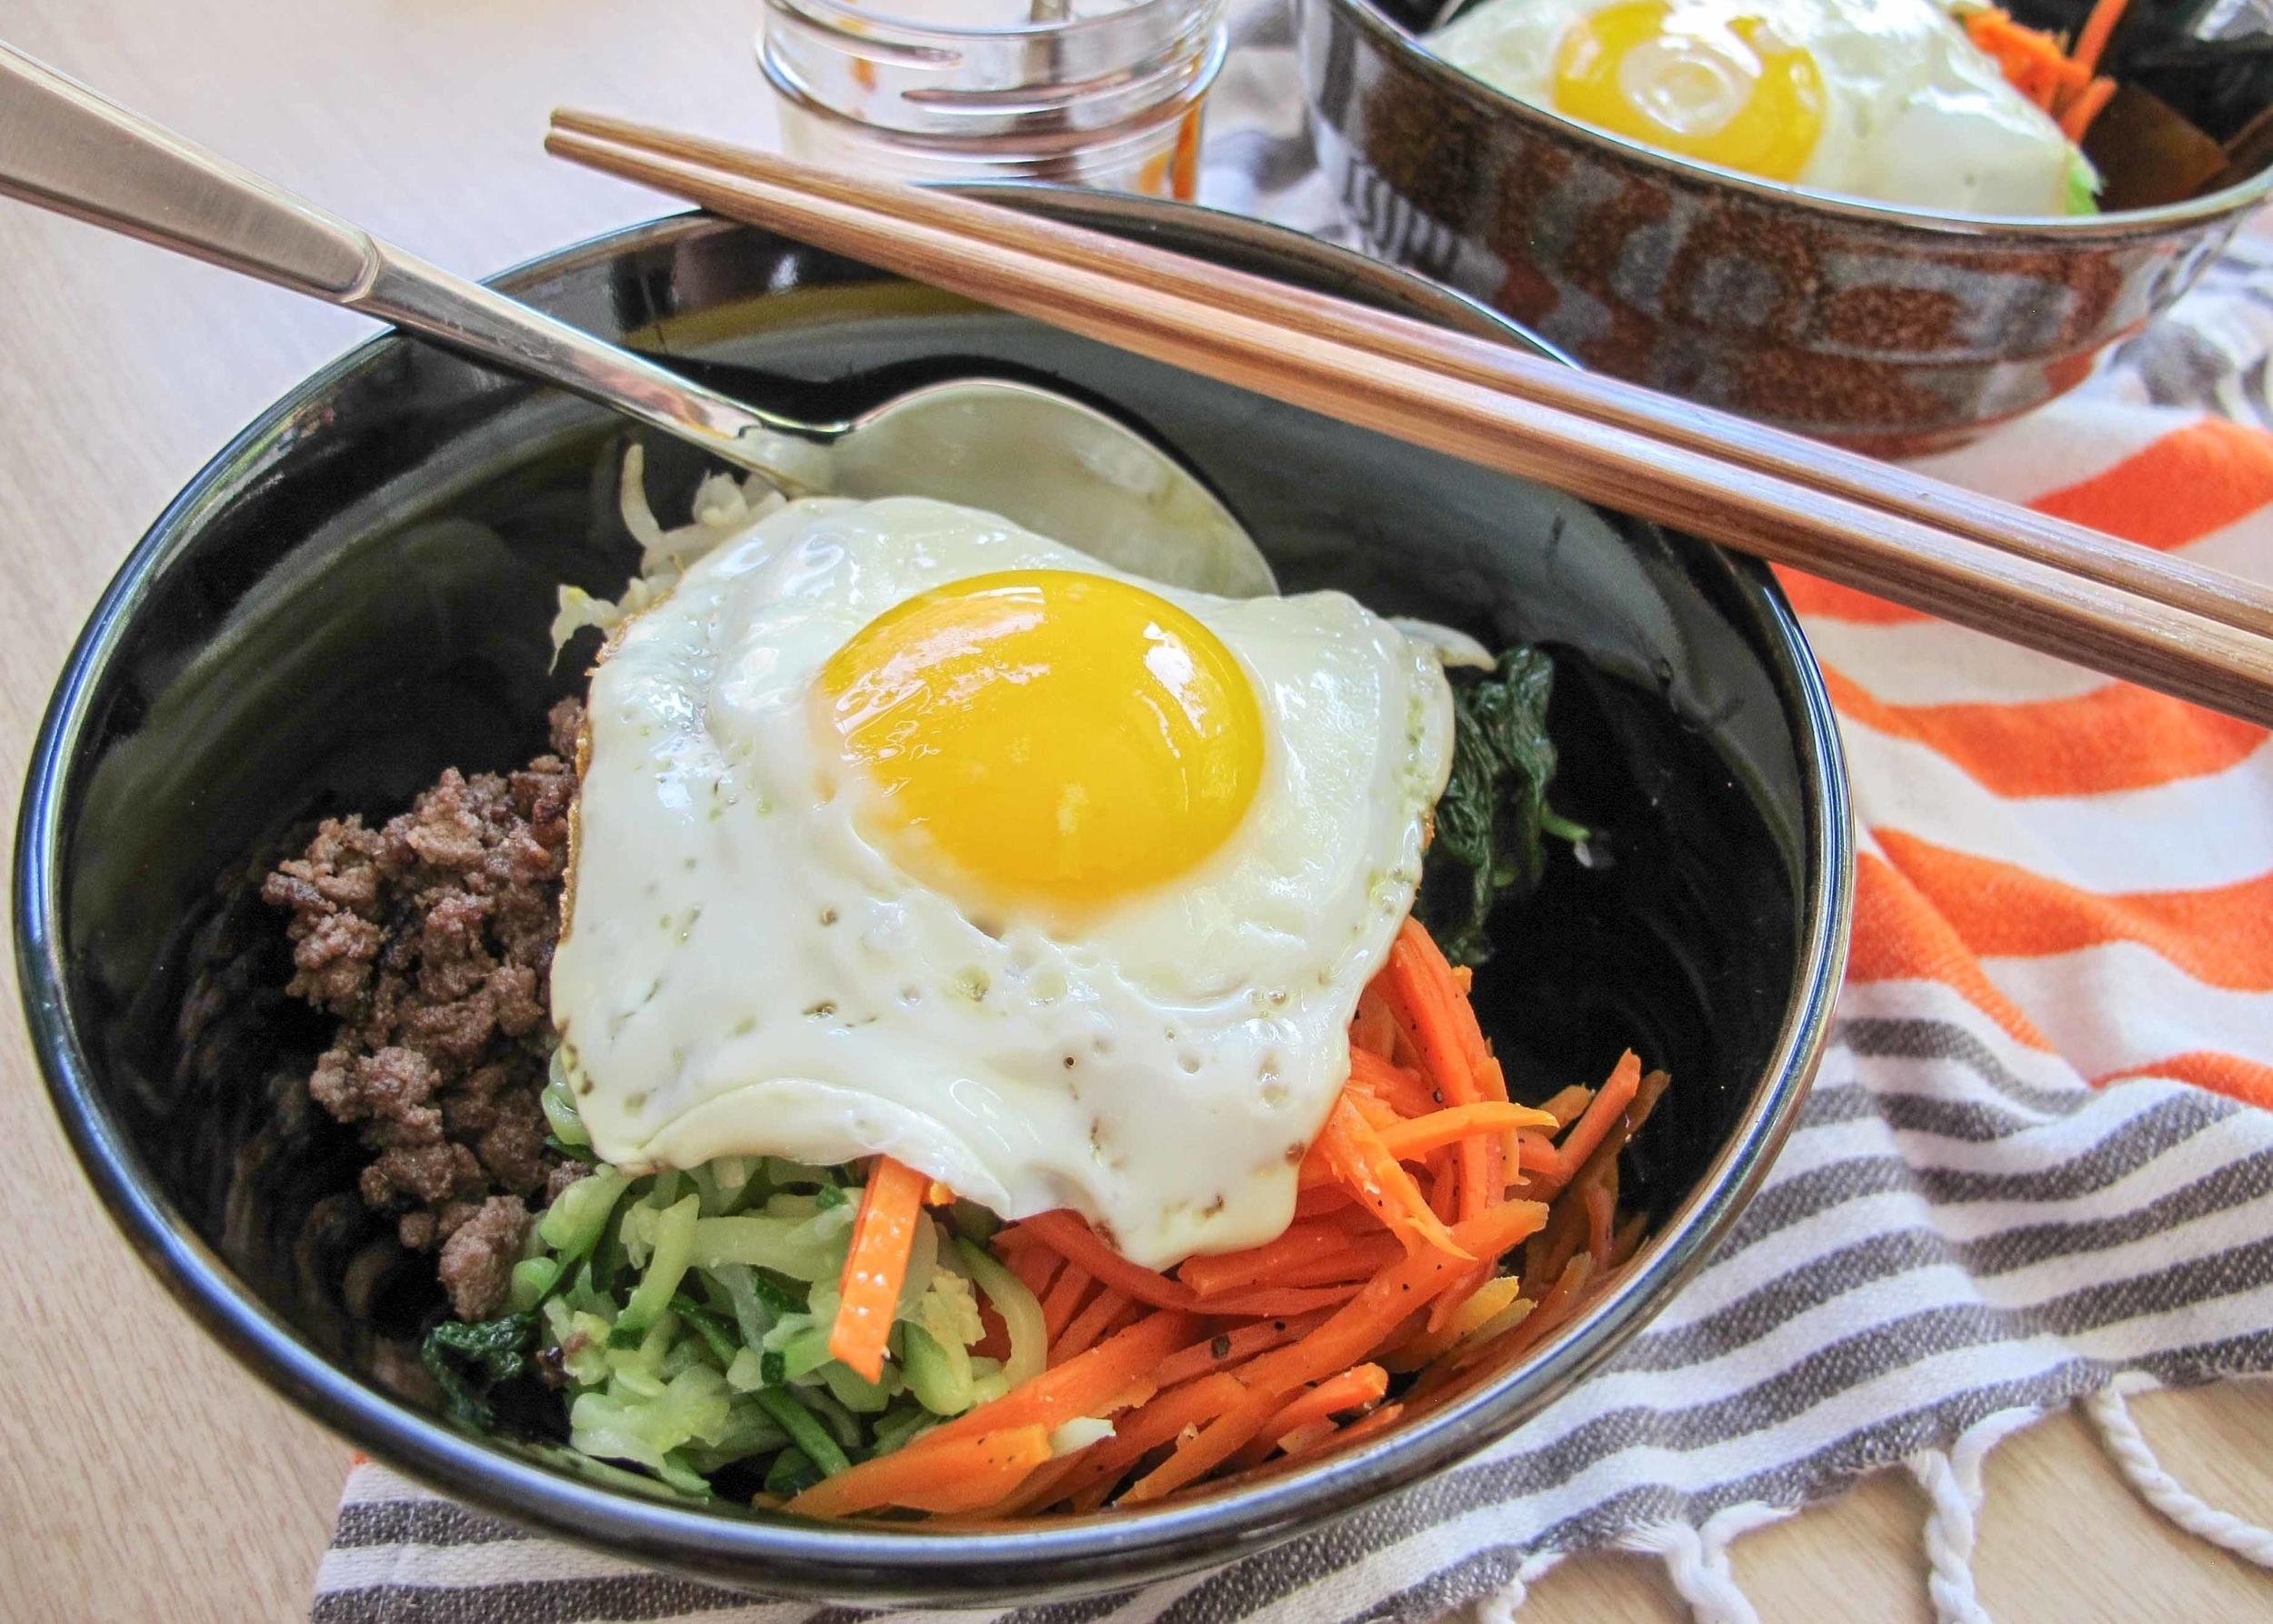 bi bim bap (Korean mixed rice)